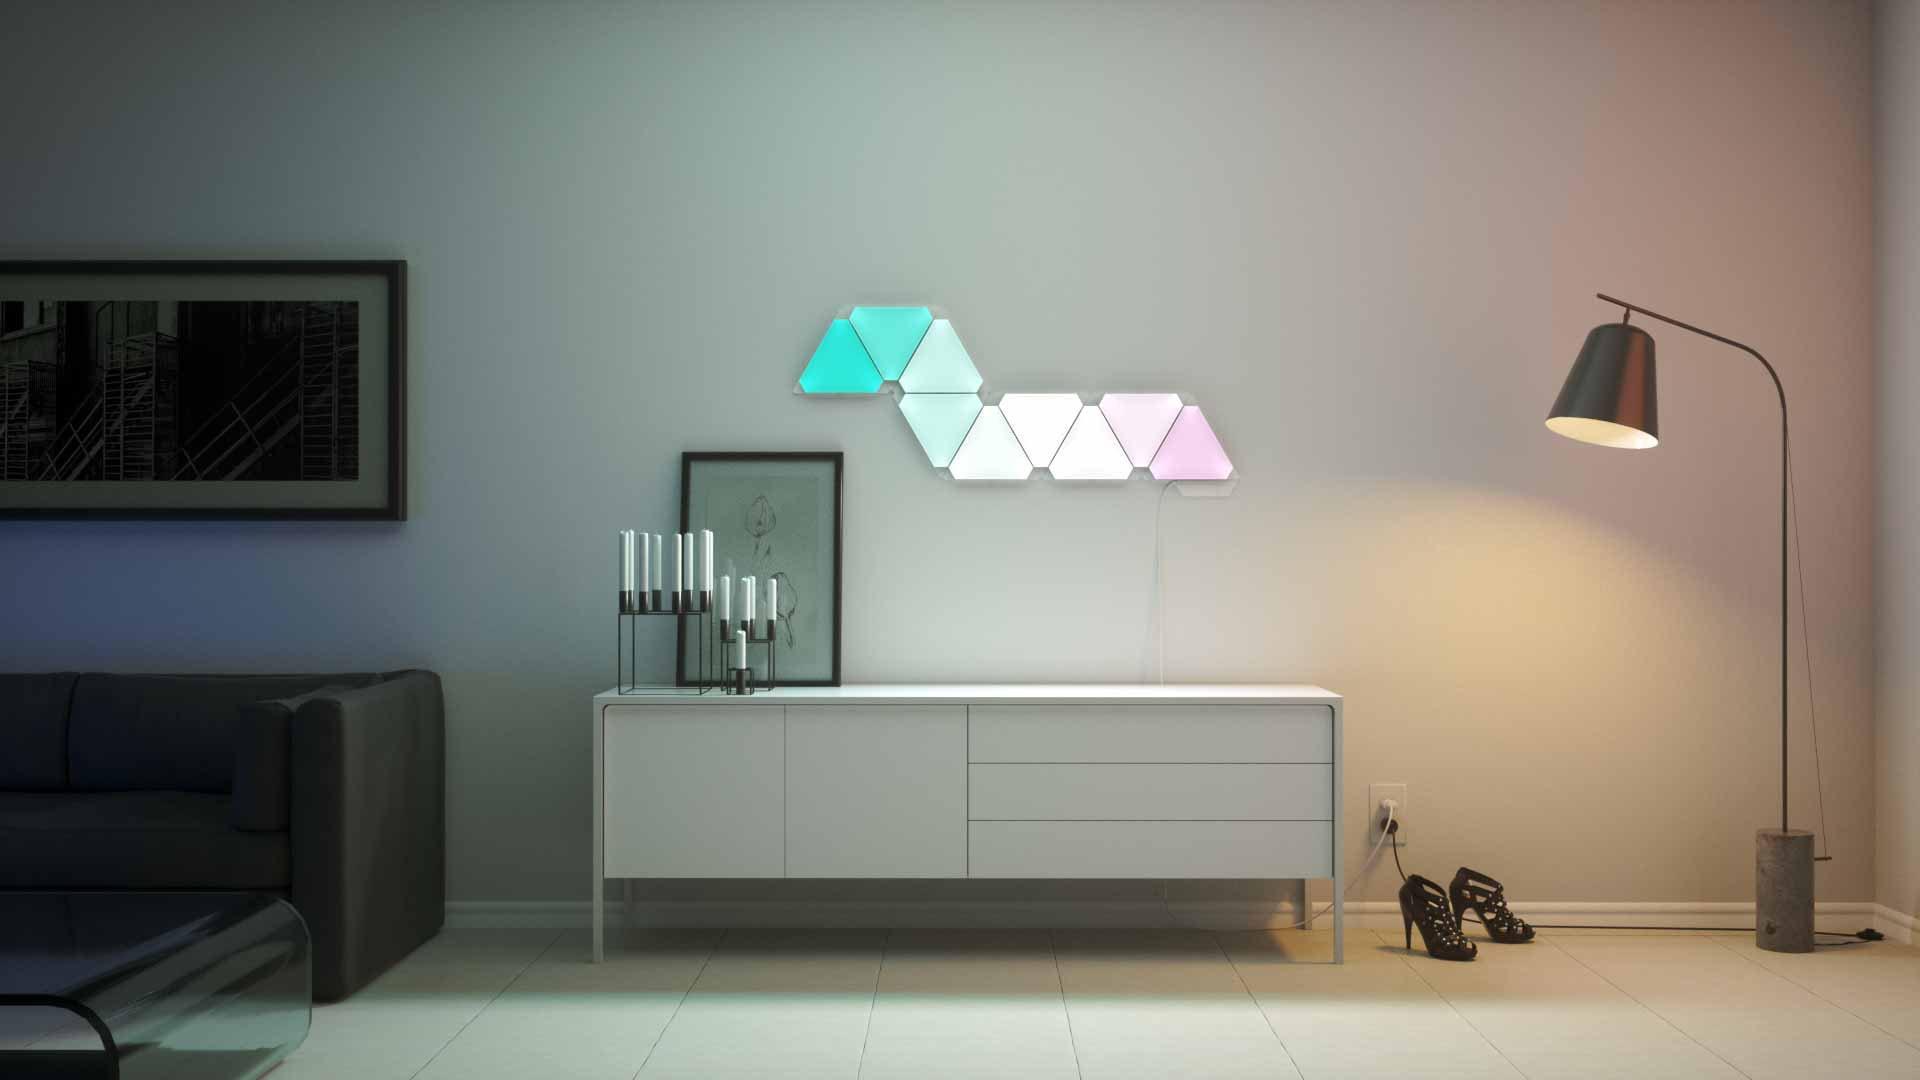 market light news full size drivers en airport global and home smart lighting